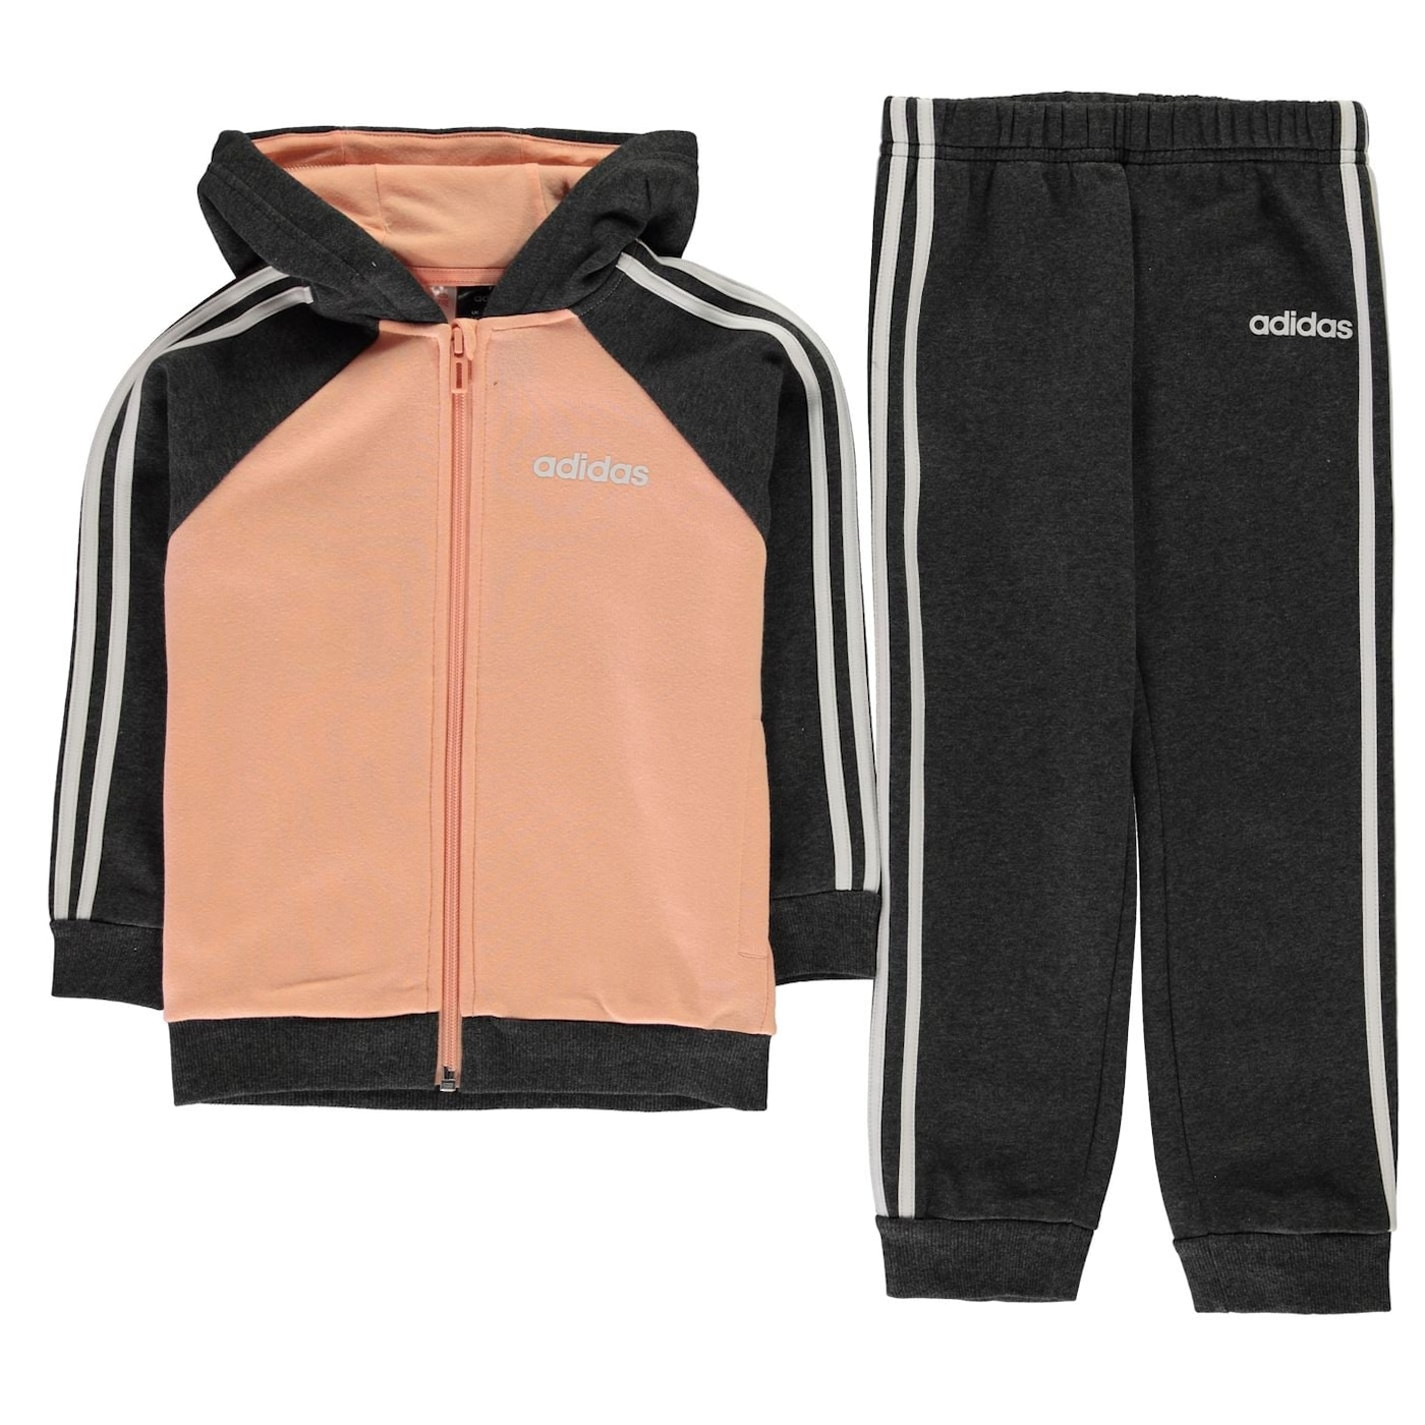 Adidas Kids 3-Stripes Jogger